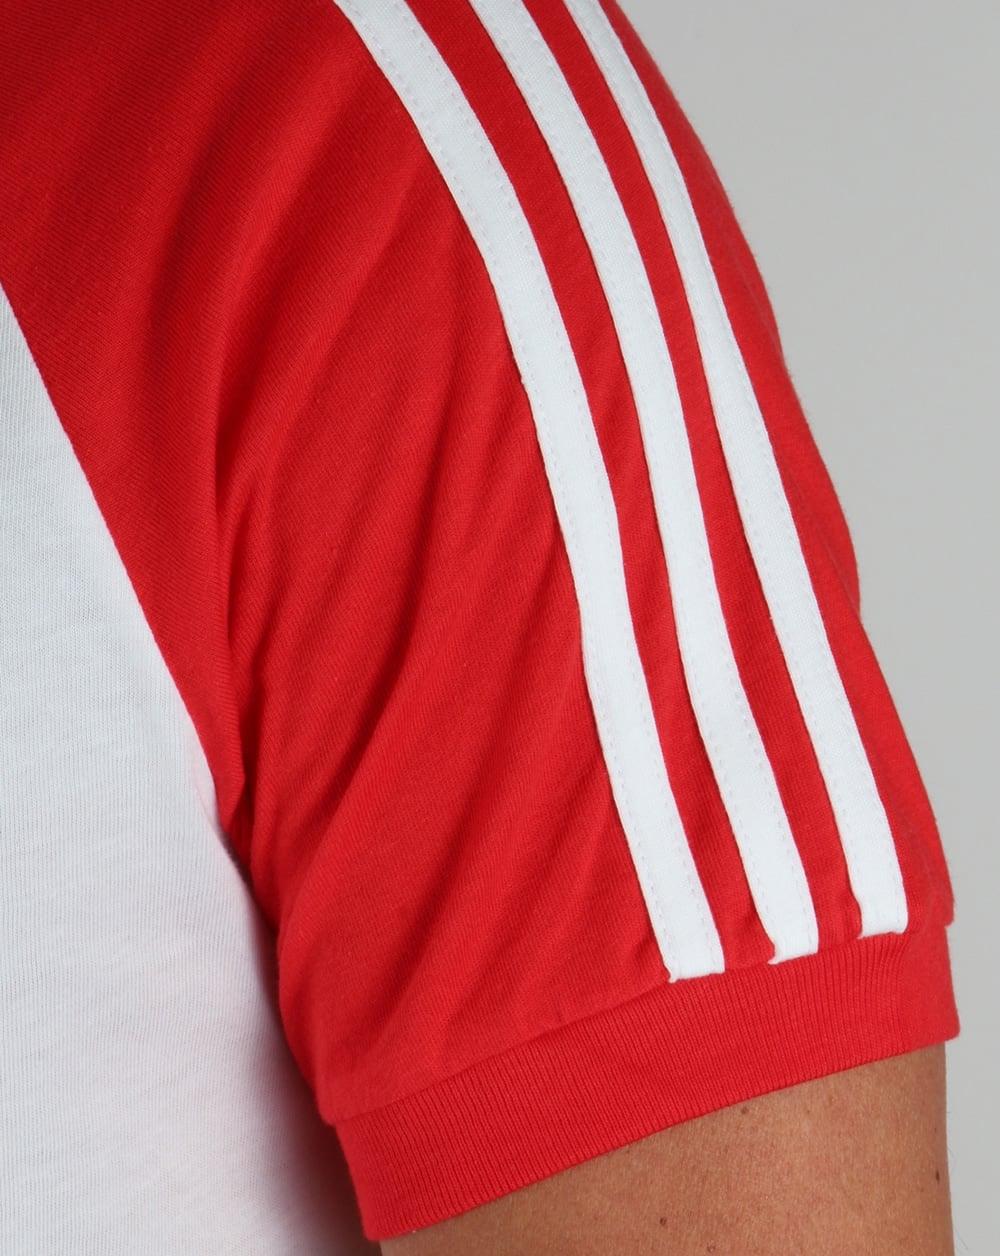 44a62aa7f57 Adidas Originals Retro 3 Stripe T-shirt White/Red,california,tee